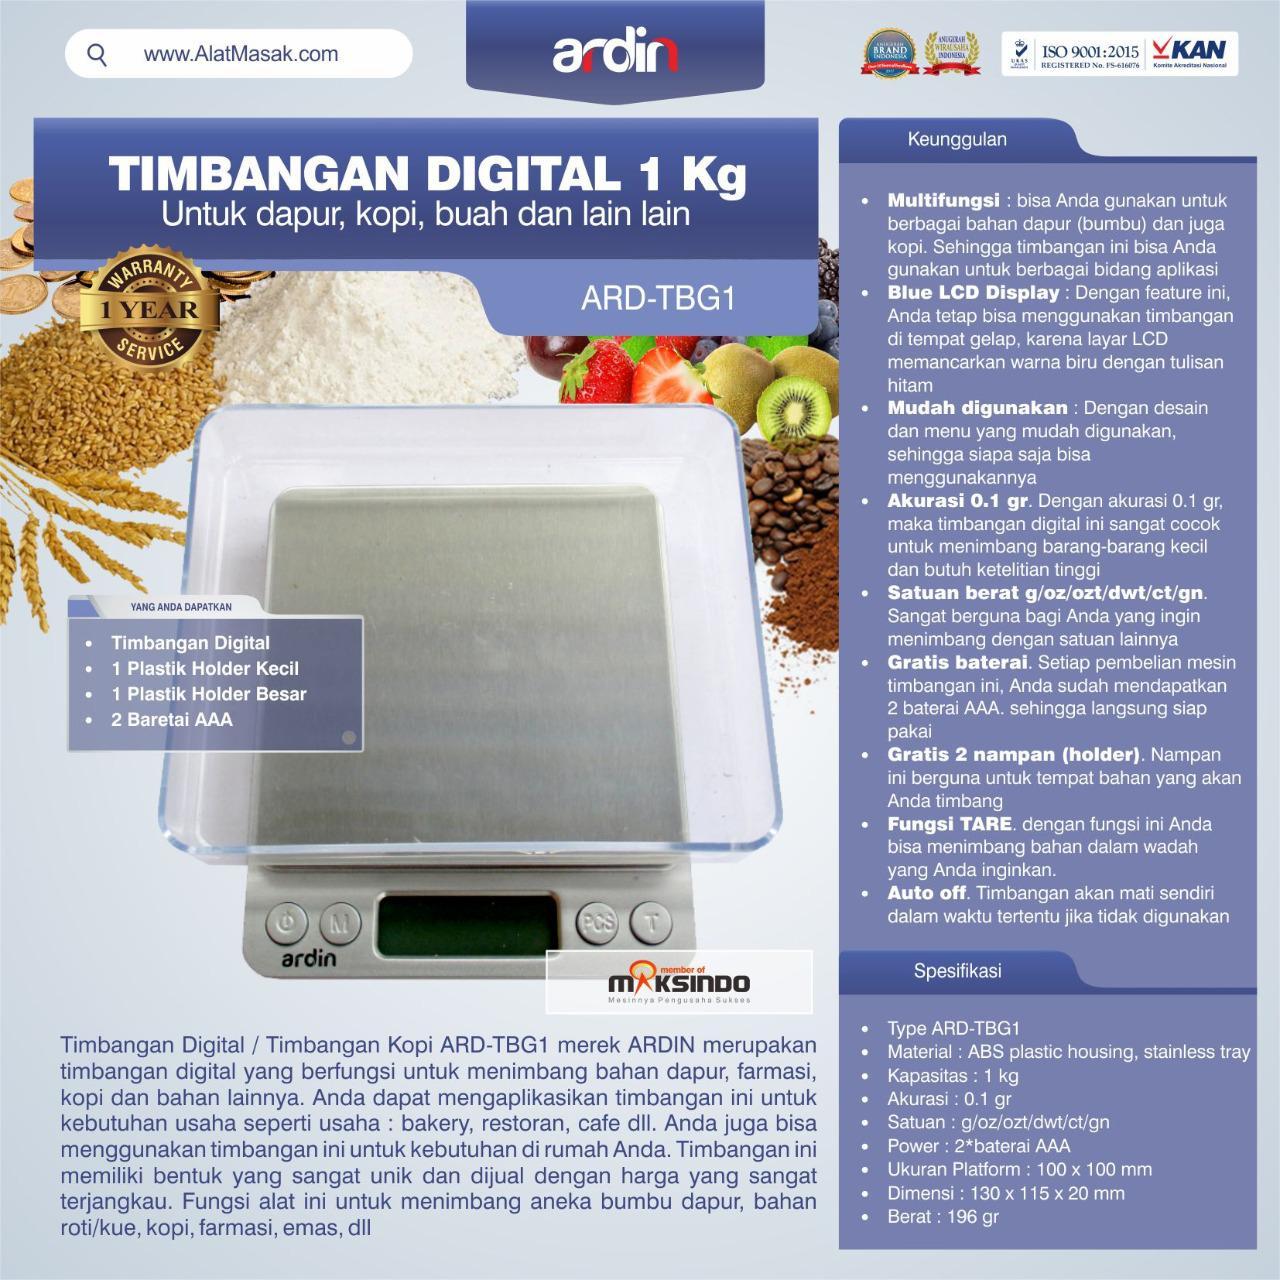 Jual Timbangan Digital Dapur 1 kg / Timbangan Kopi ARD-TBG1 di Semarang